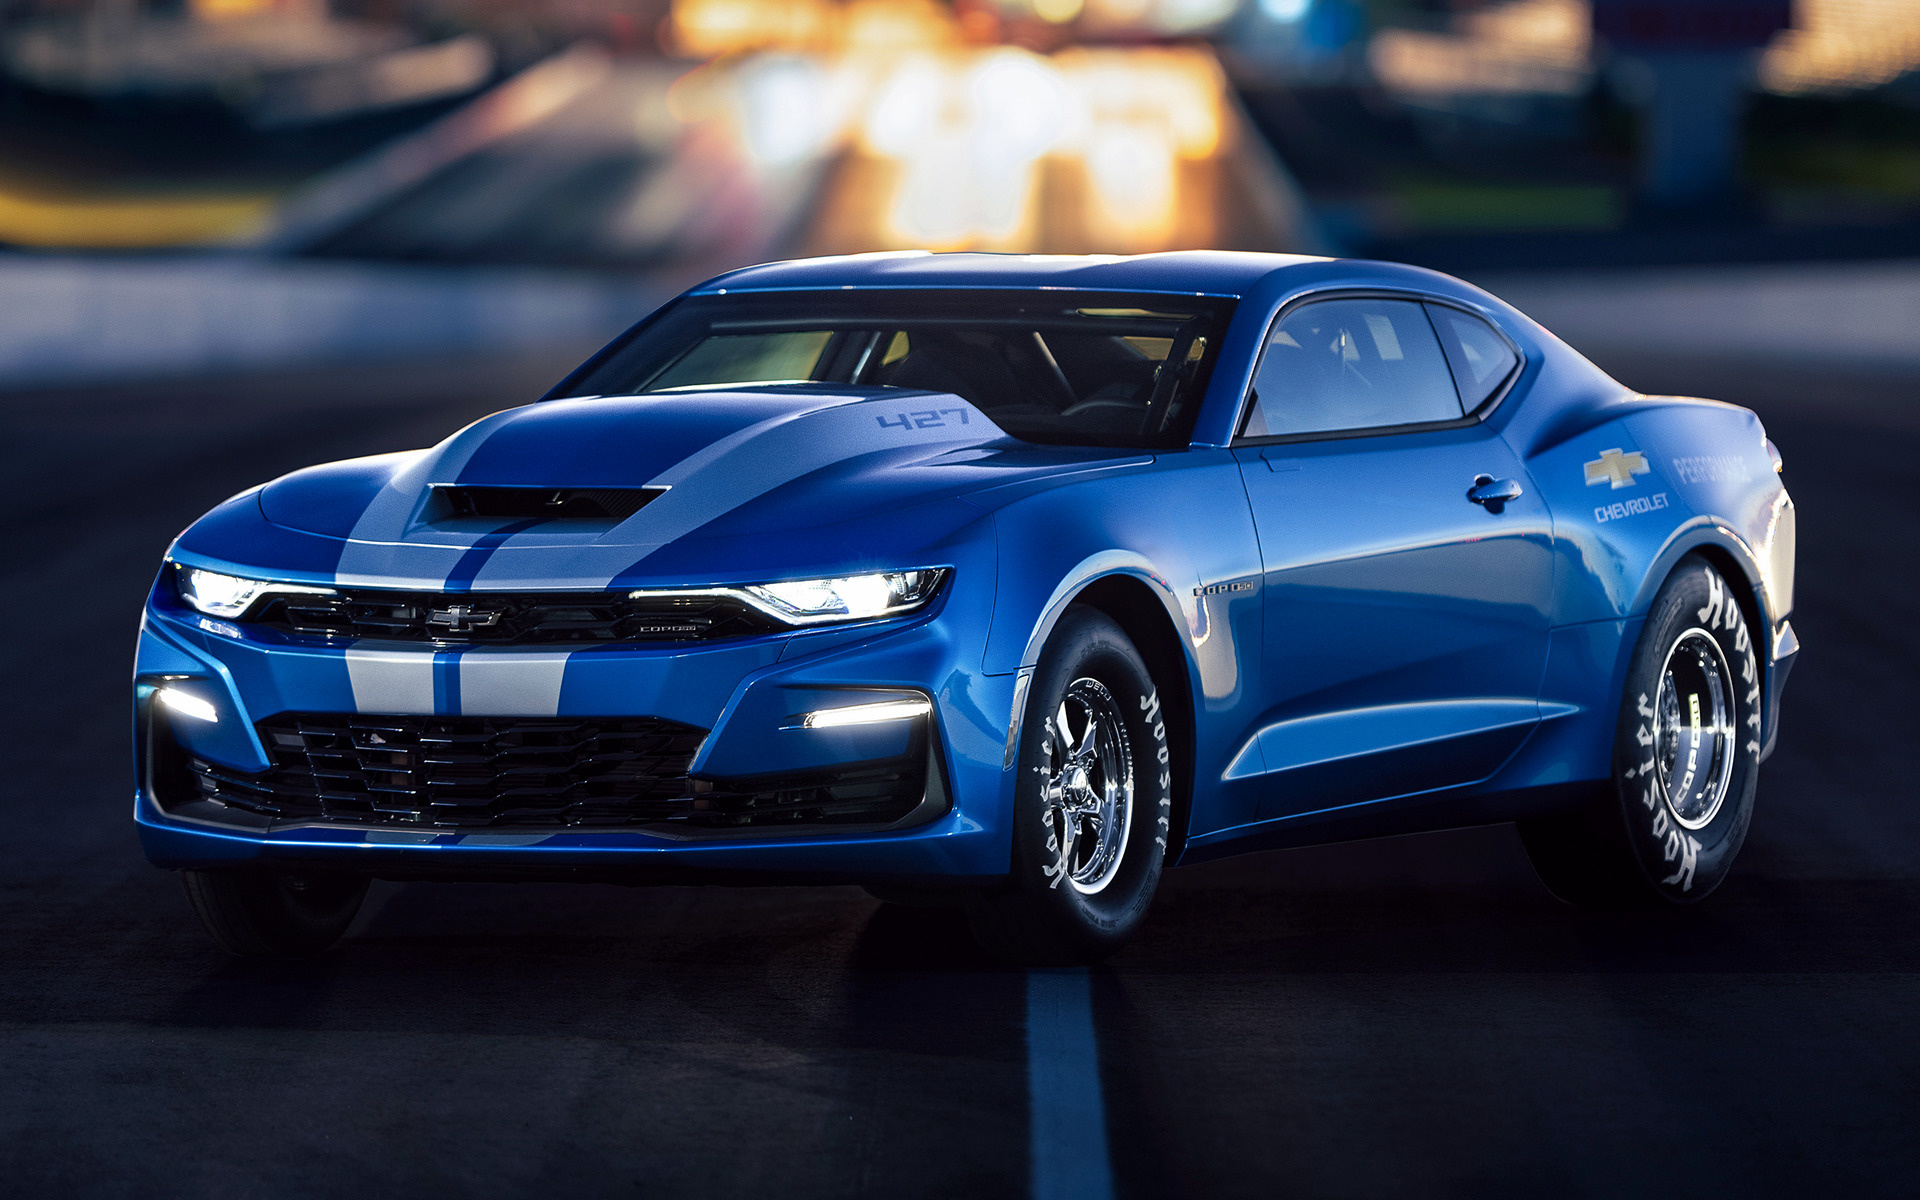 2019 Chevrolet COPO Camaro 50th Anniversary - Wallpapers ...